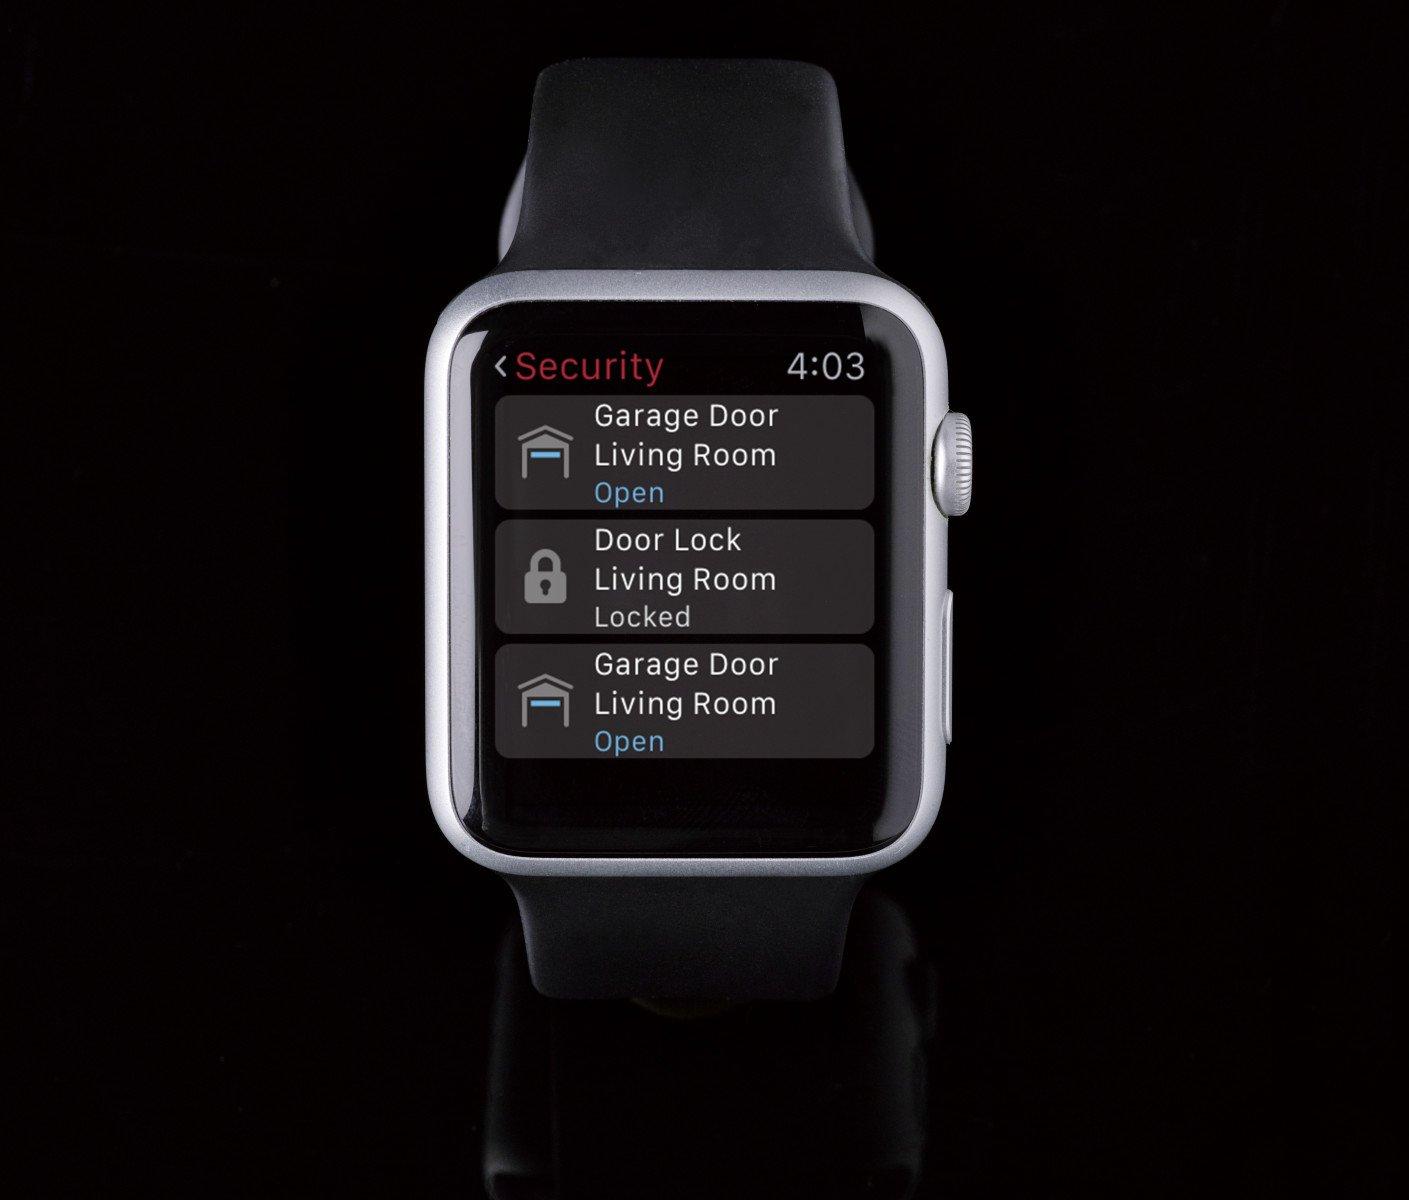 Control4 Apple Watch app